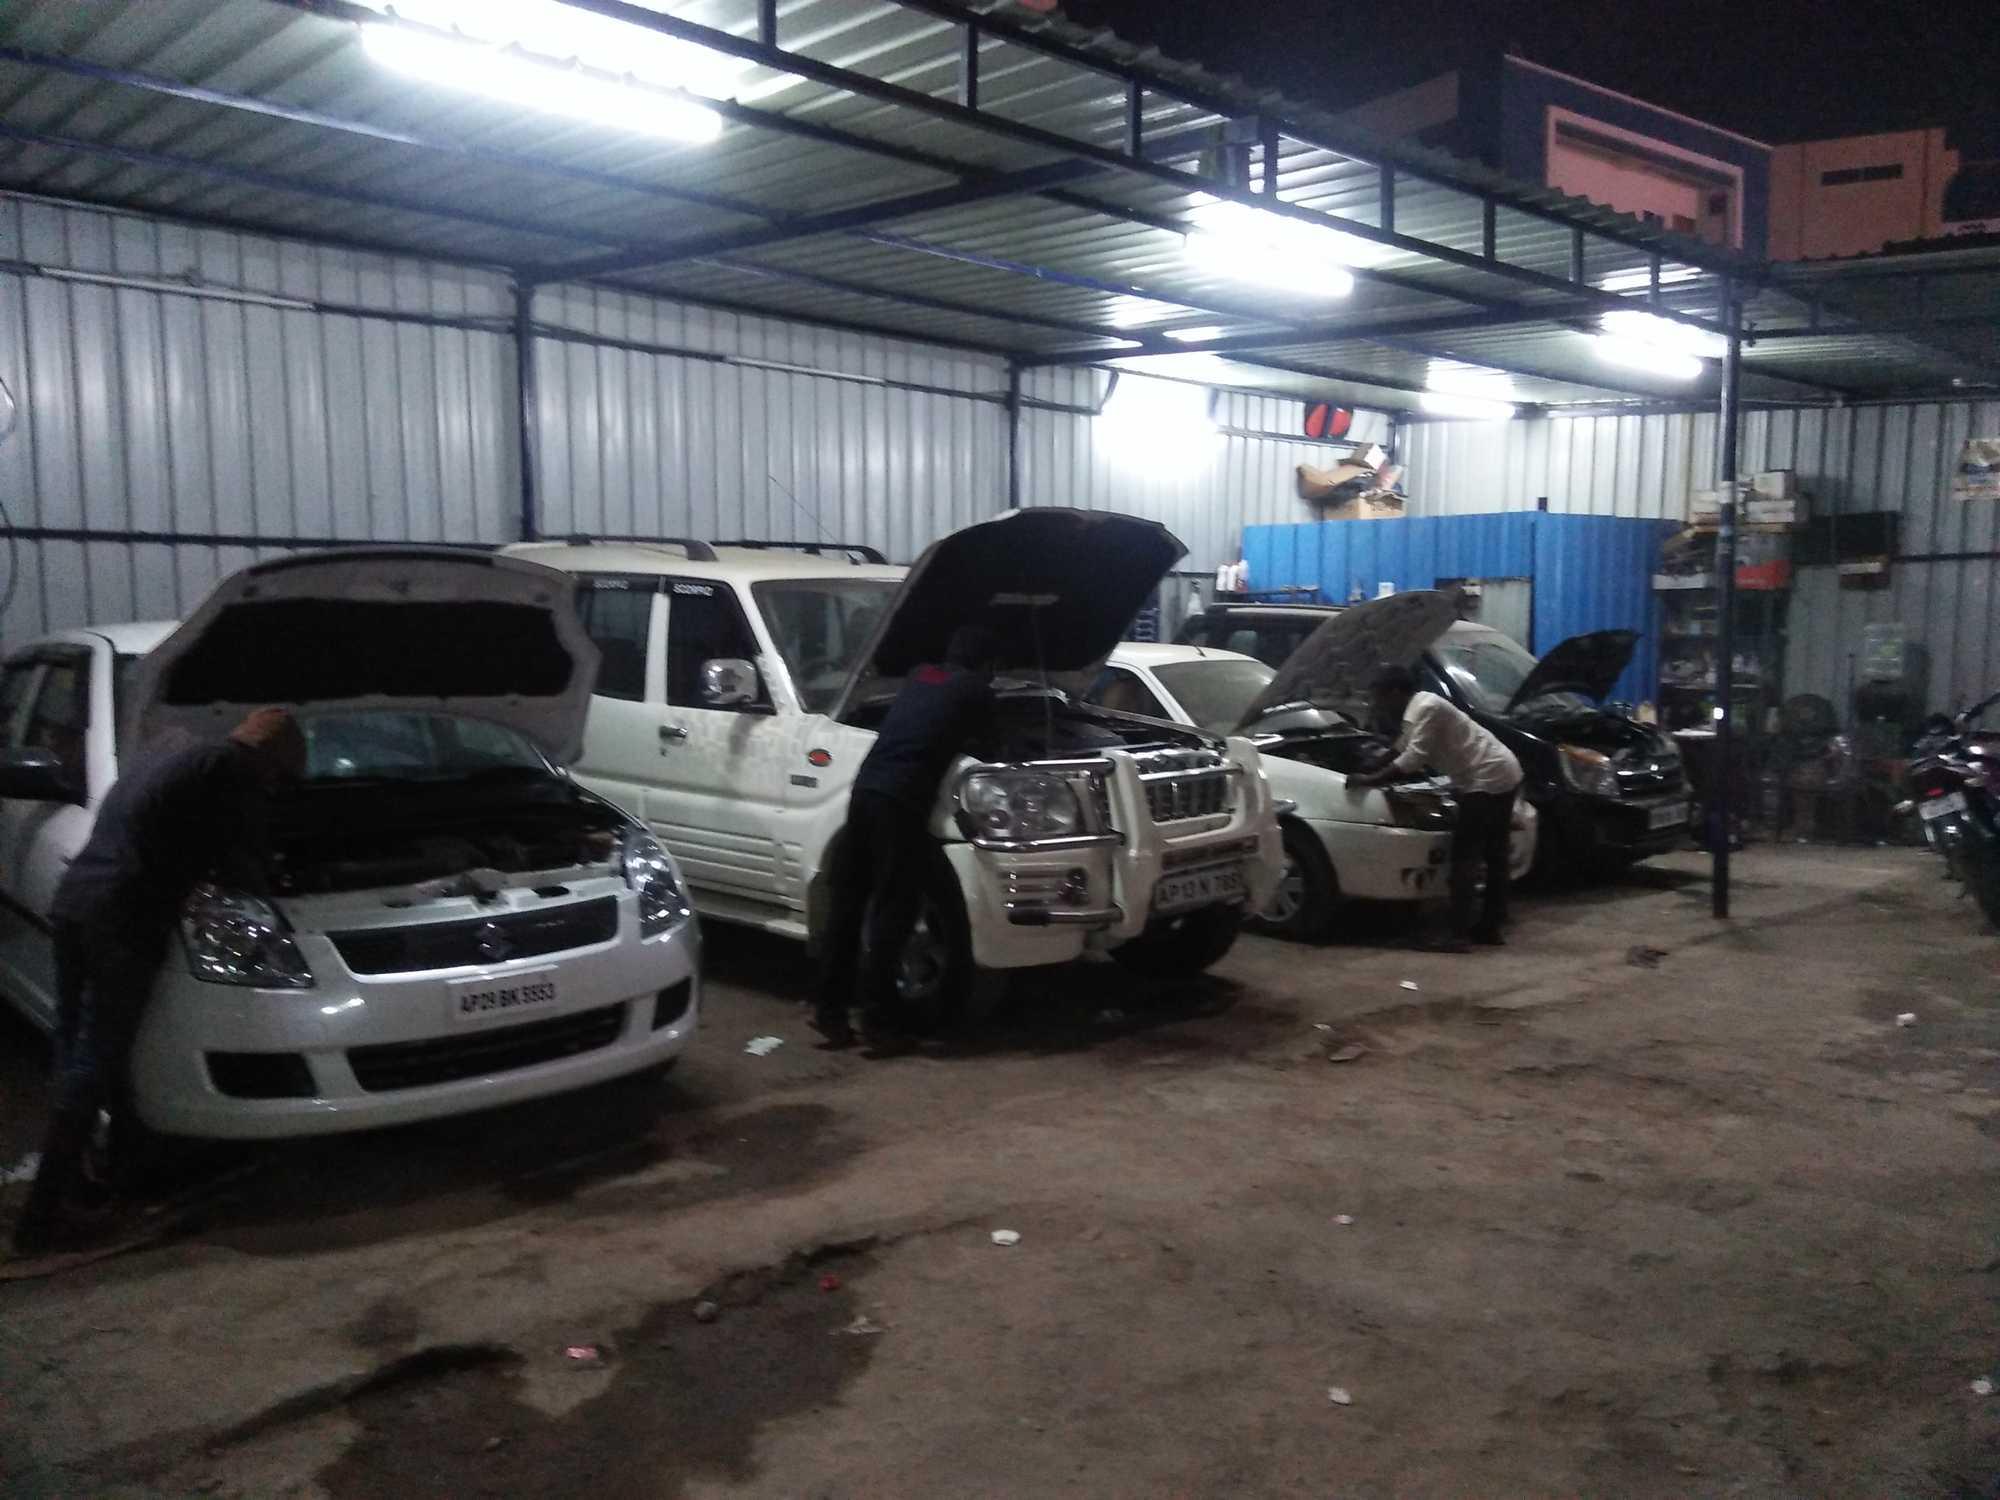 Repair Shops Near Me >> Auto Repair Shops Near Me 2020 Upcoming Car Release